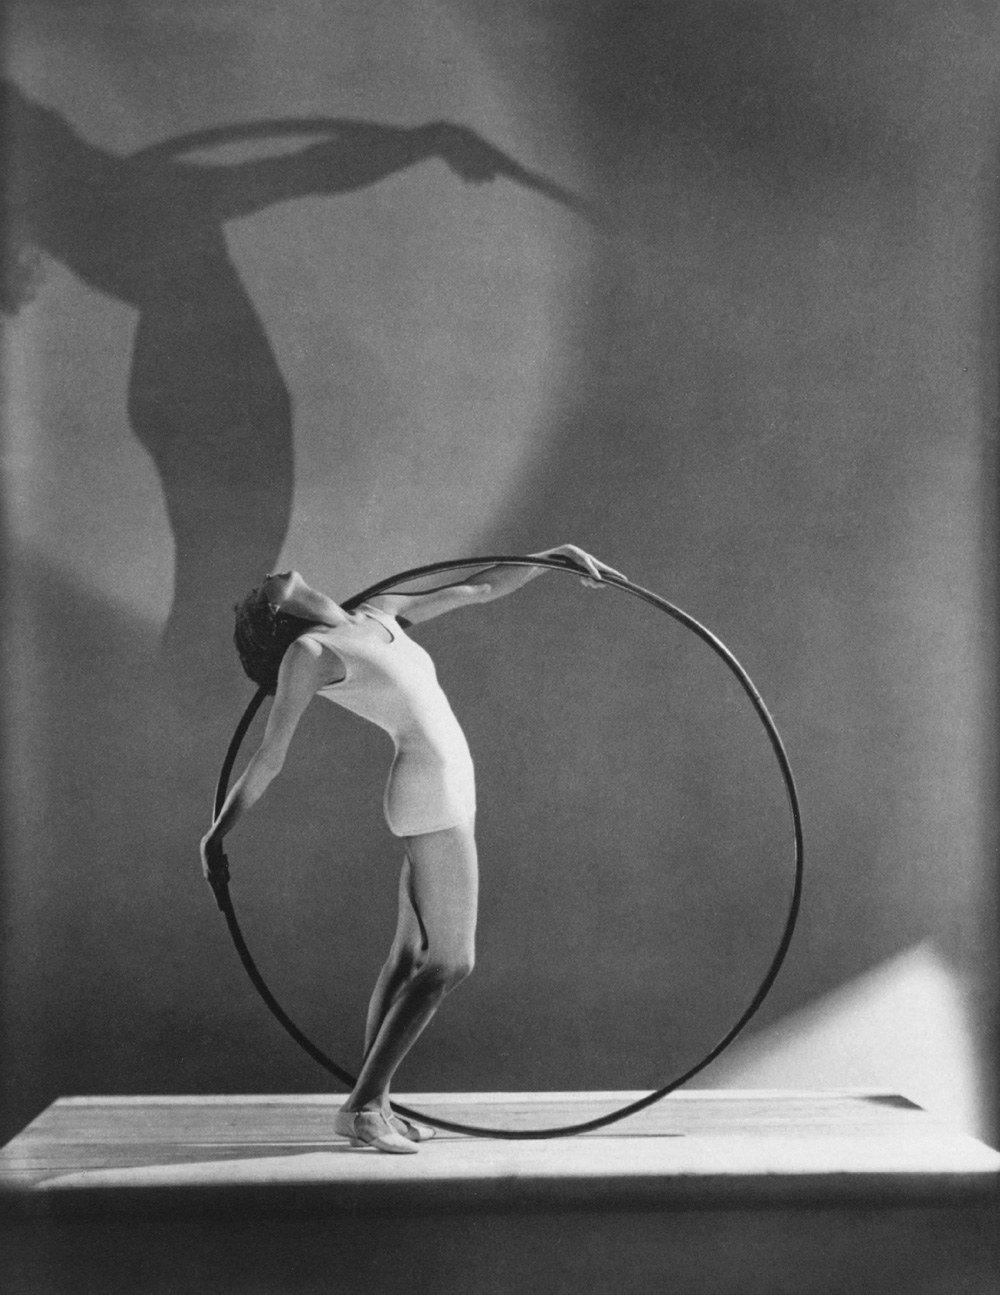 George-Hoyningen-Huene-Swimwear-with-Hoola-Hoop